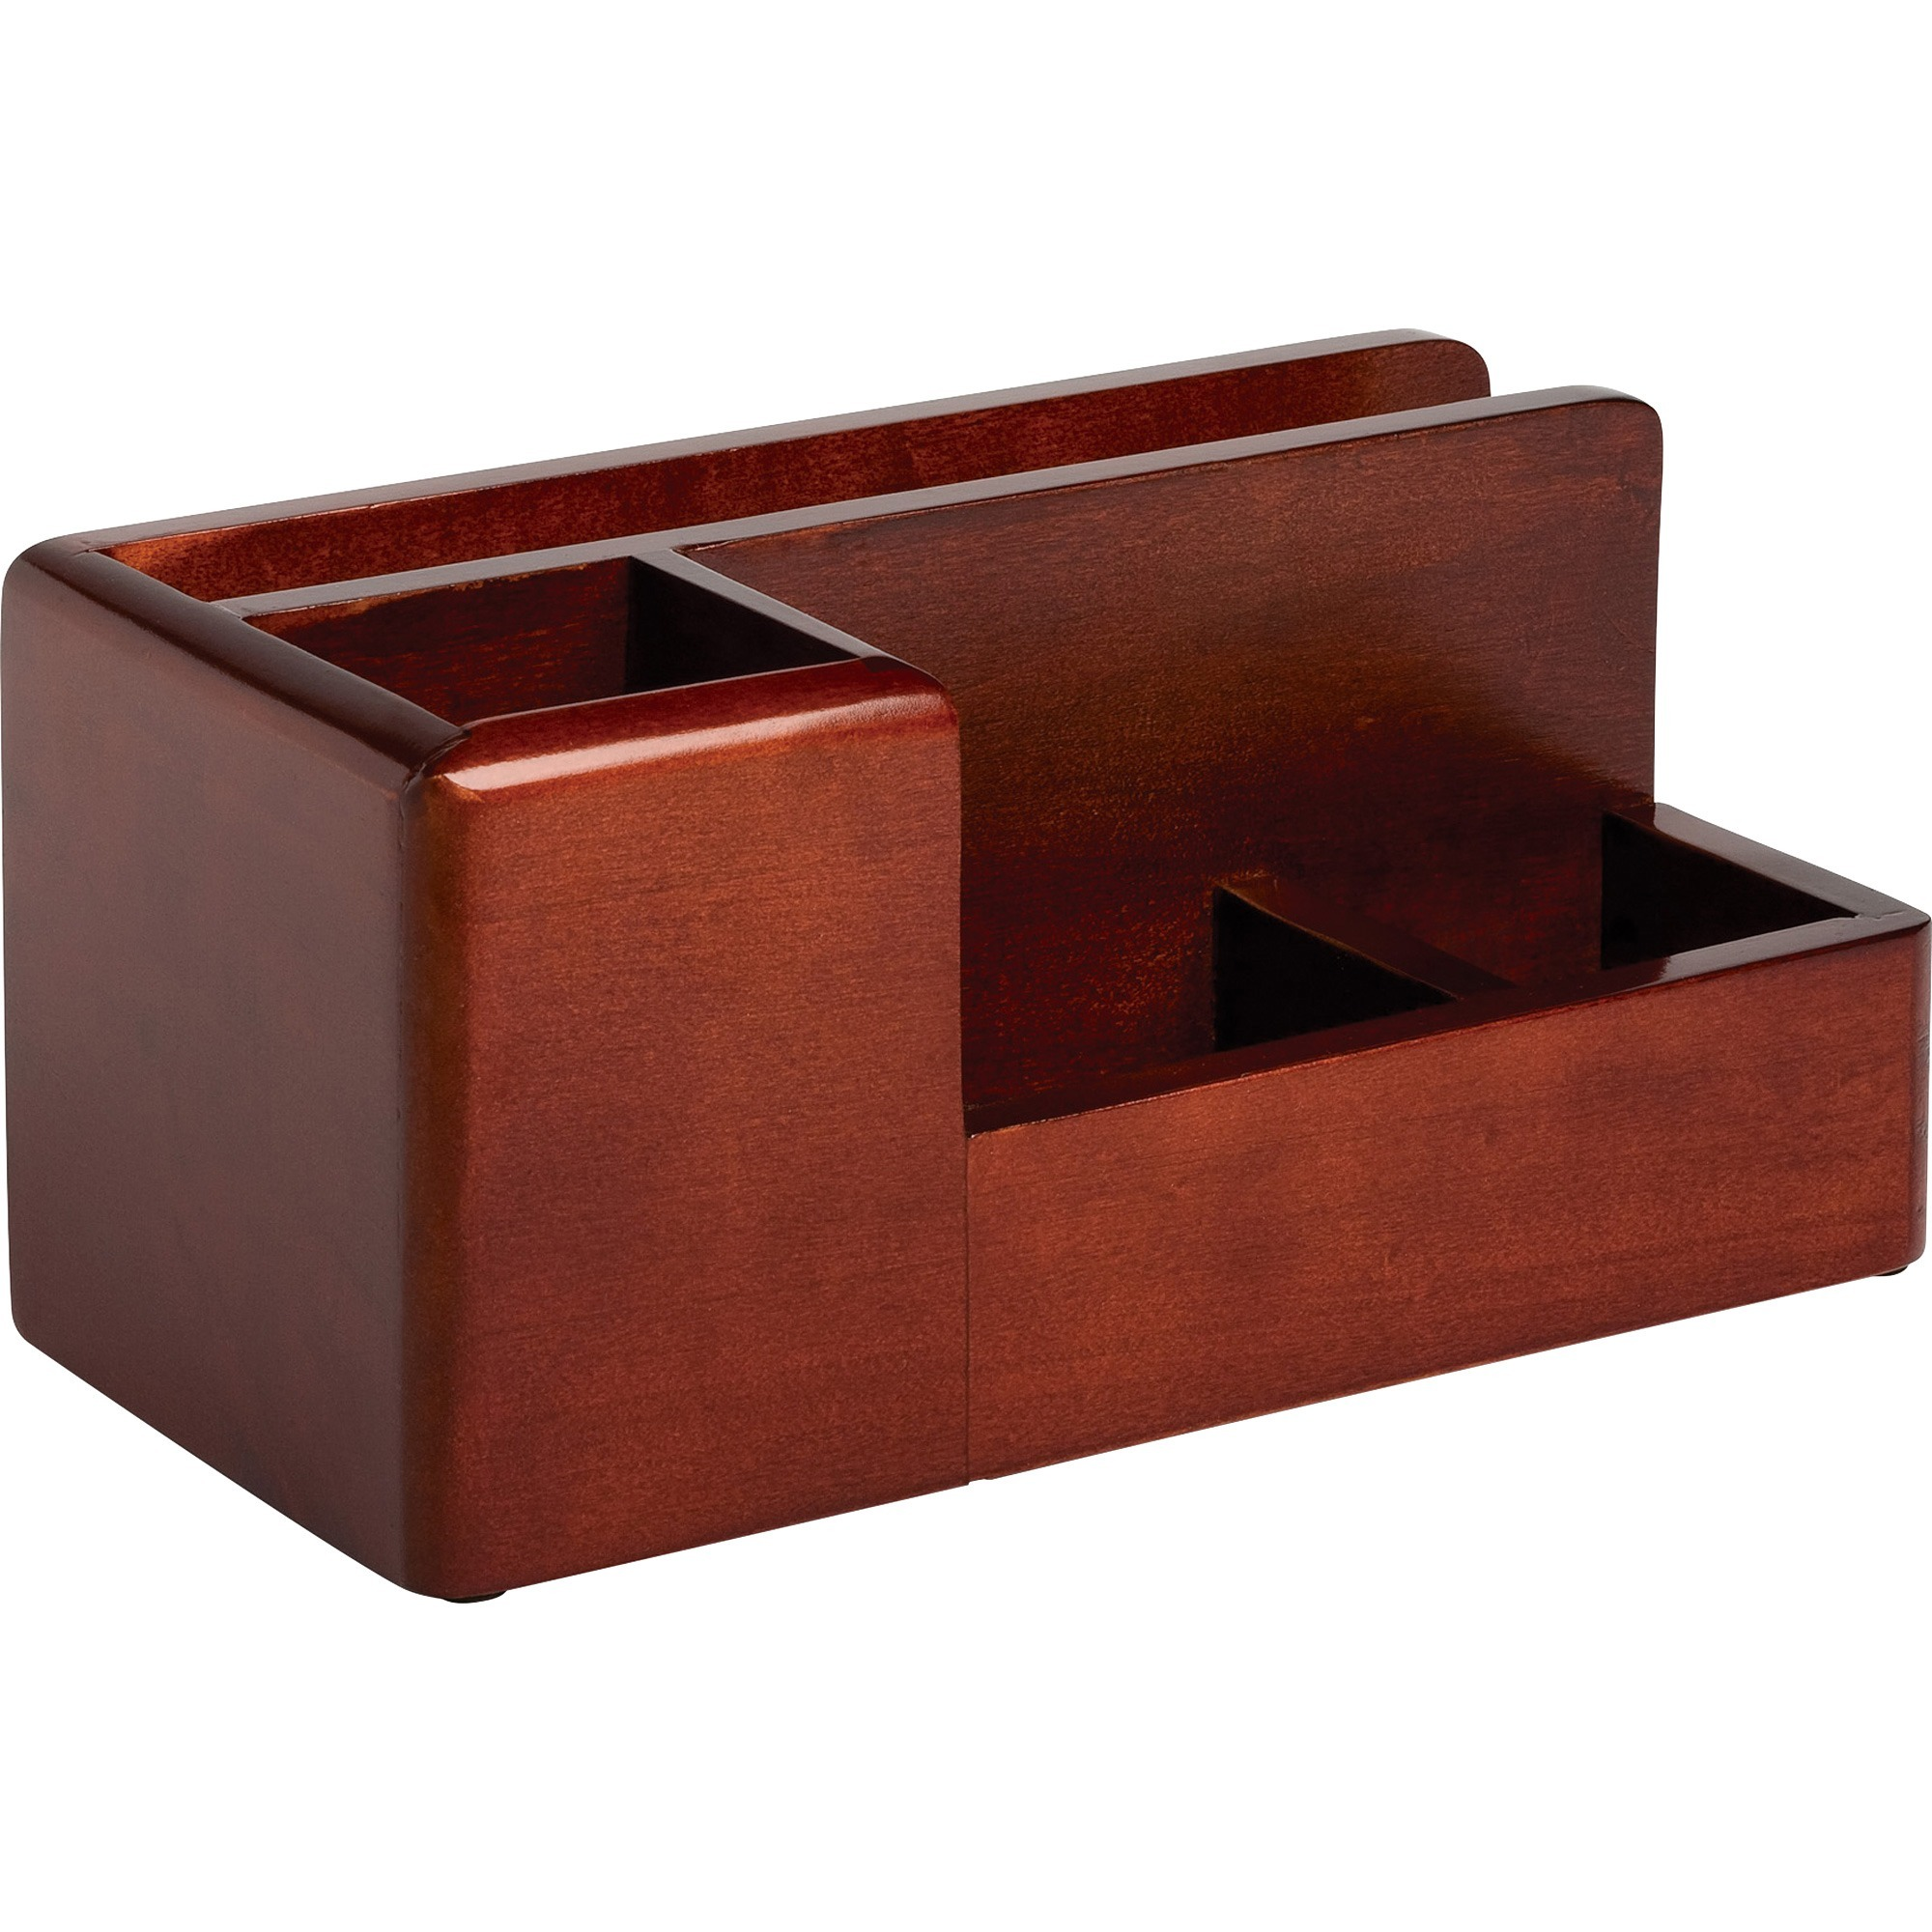 Rol1734648 Rolodex Wood Tones Desktop Organizer Gsa